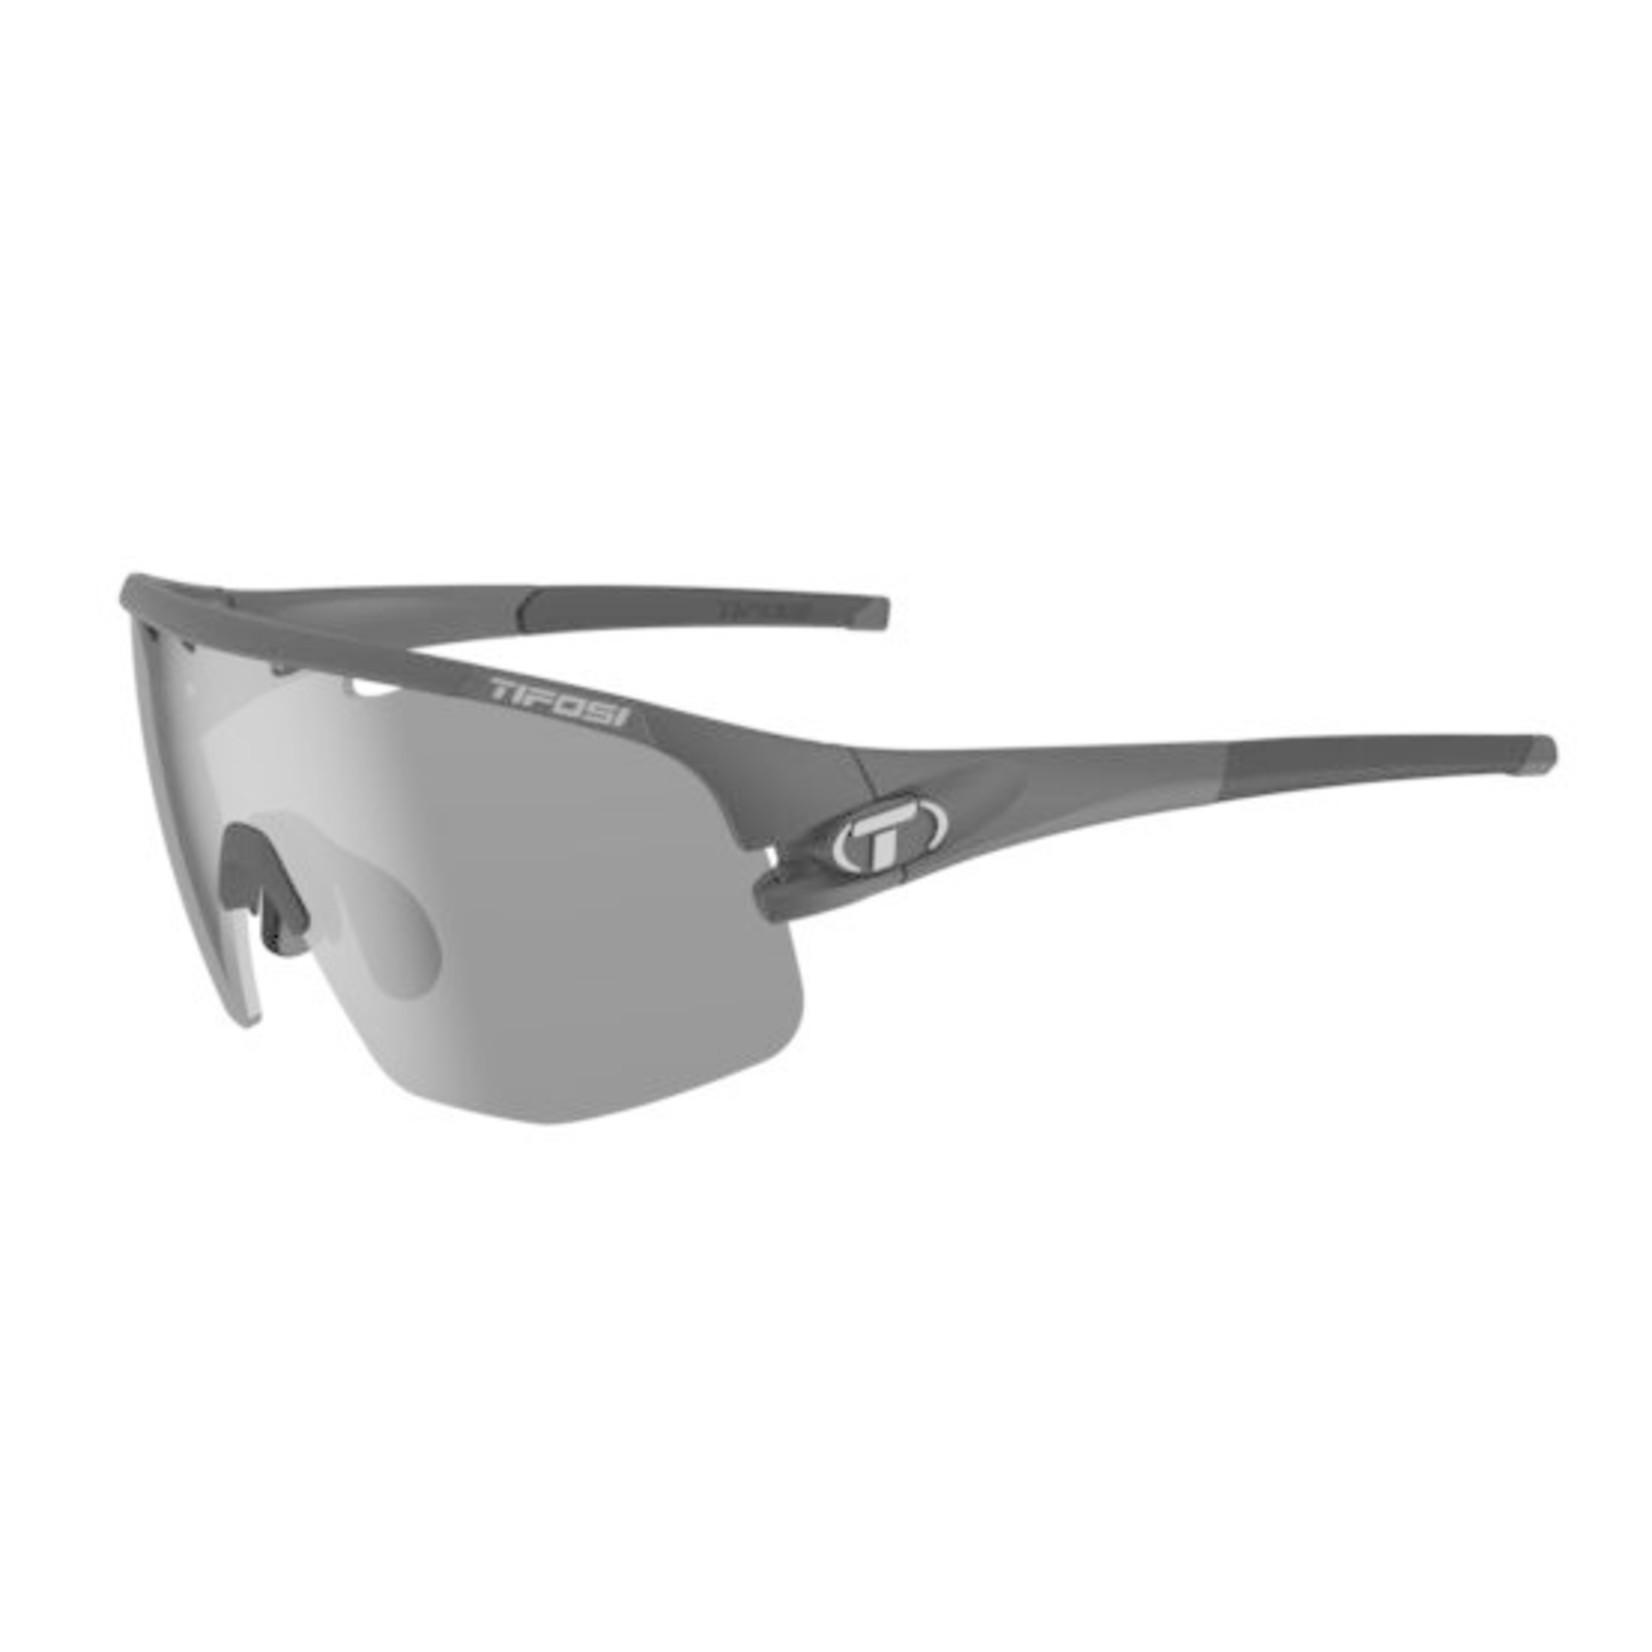 Tifosi Optics Sledge Lite, Matte Black Fototec Sunglasses